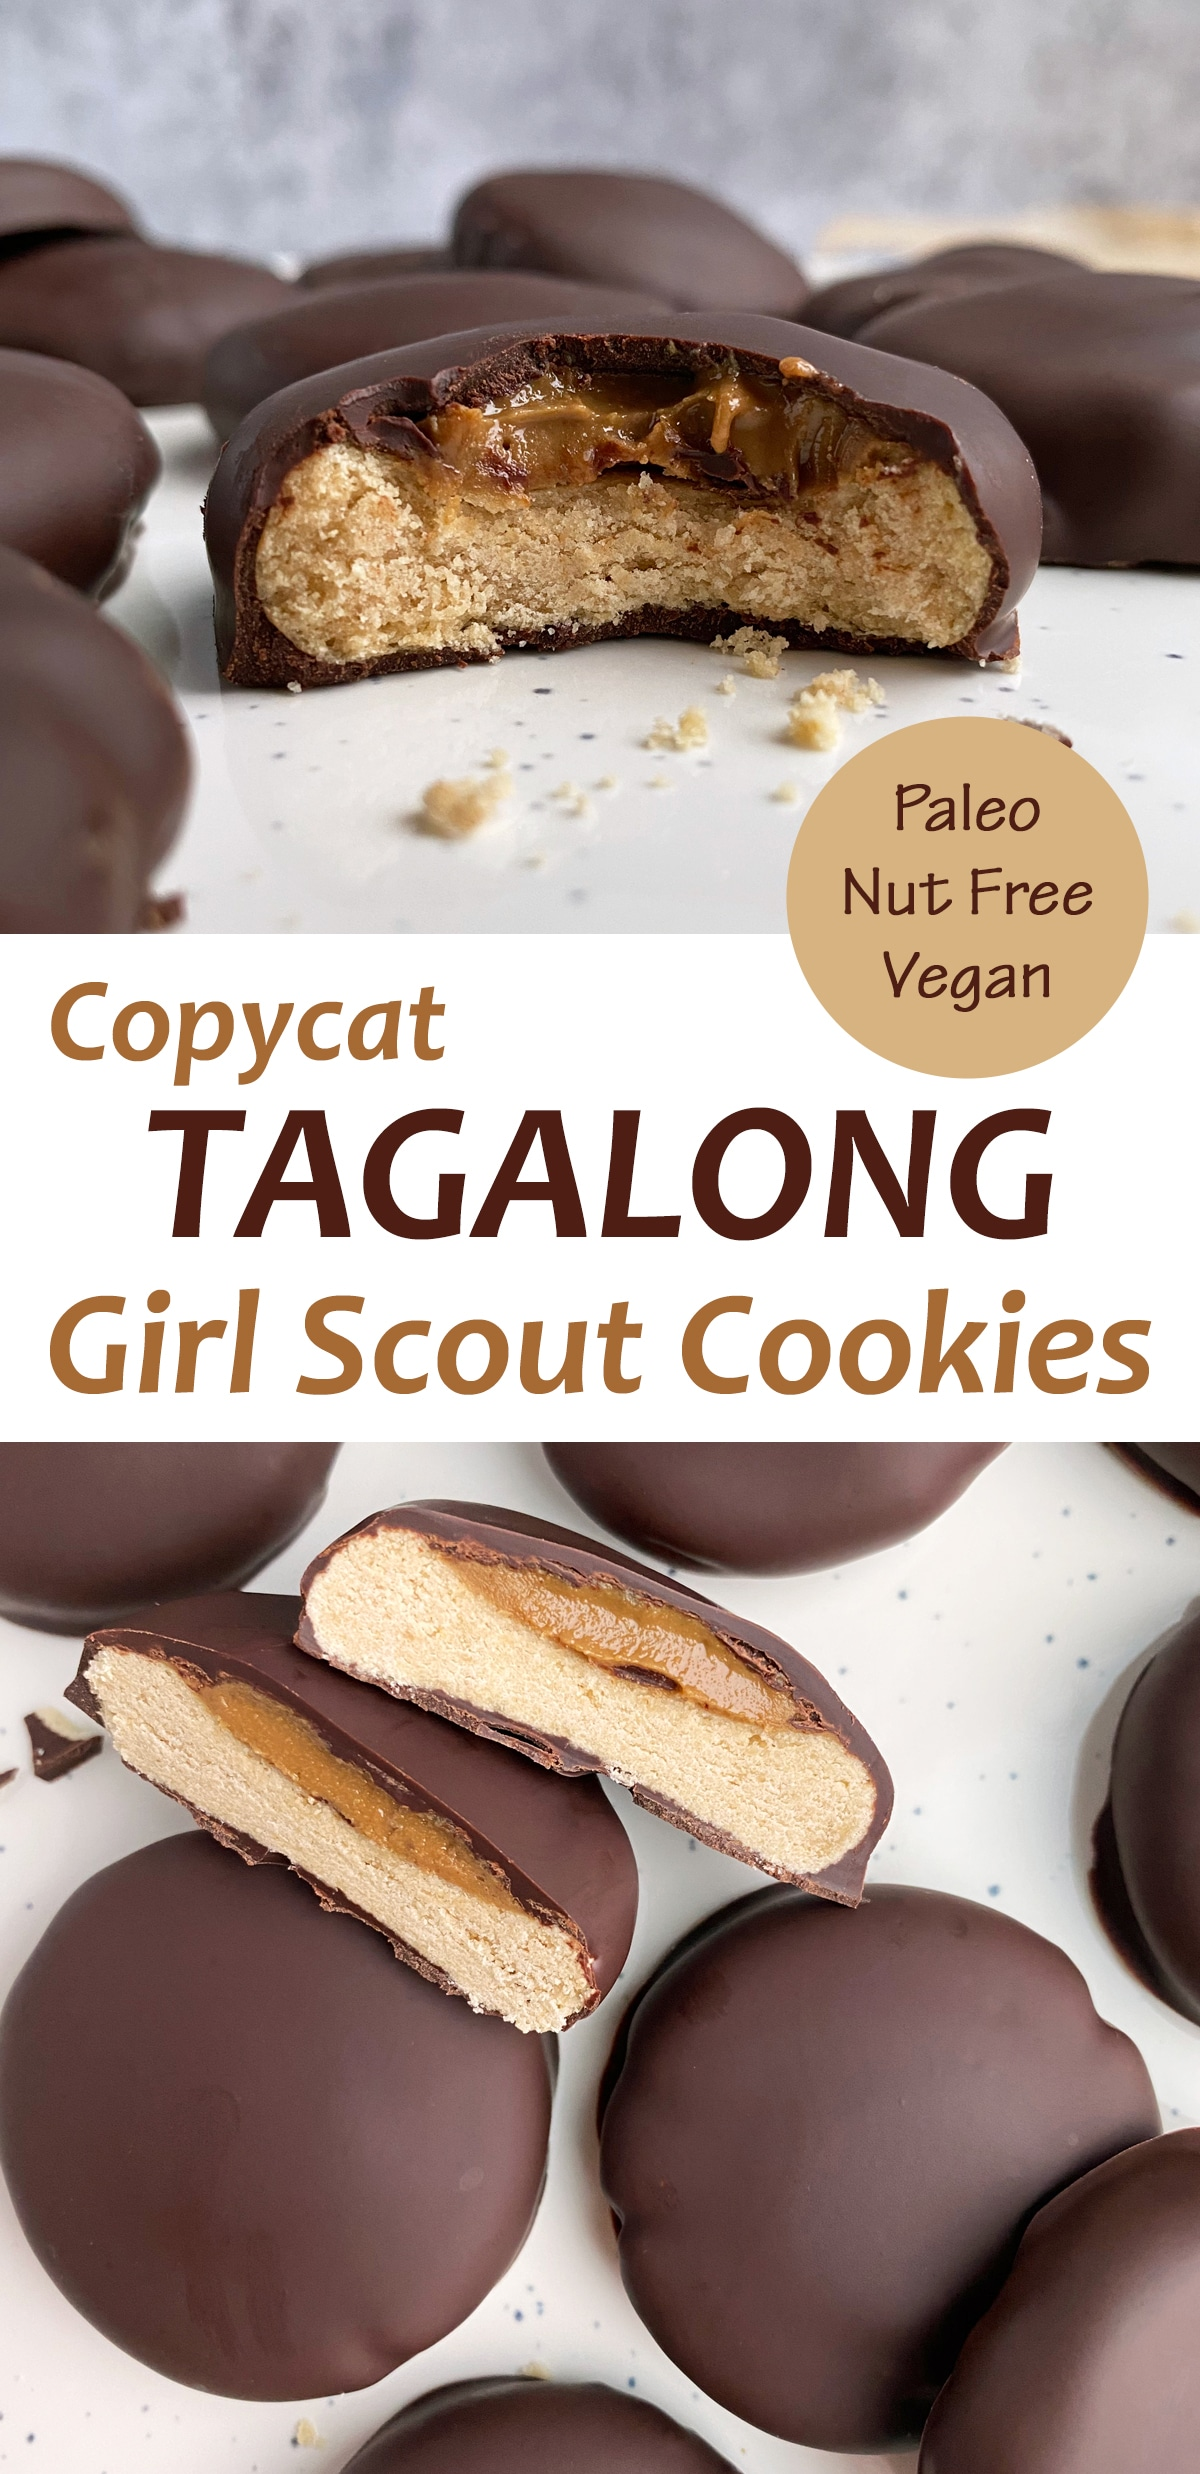 Copycat-Paleo-Tagalong-Girl-Scout-Cookies-Pinterest-Image